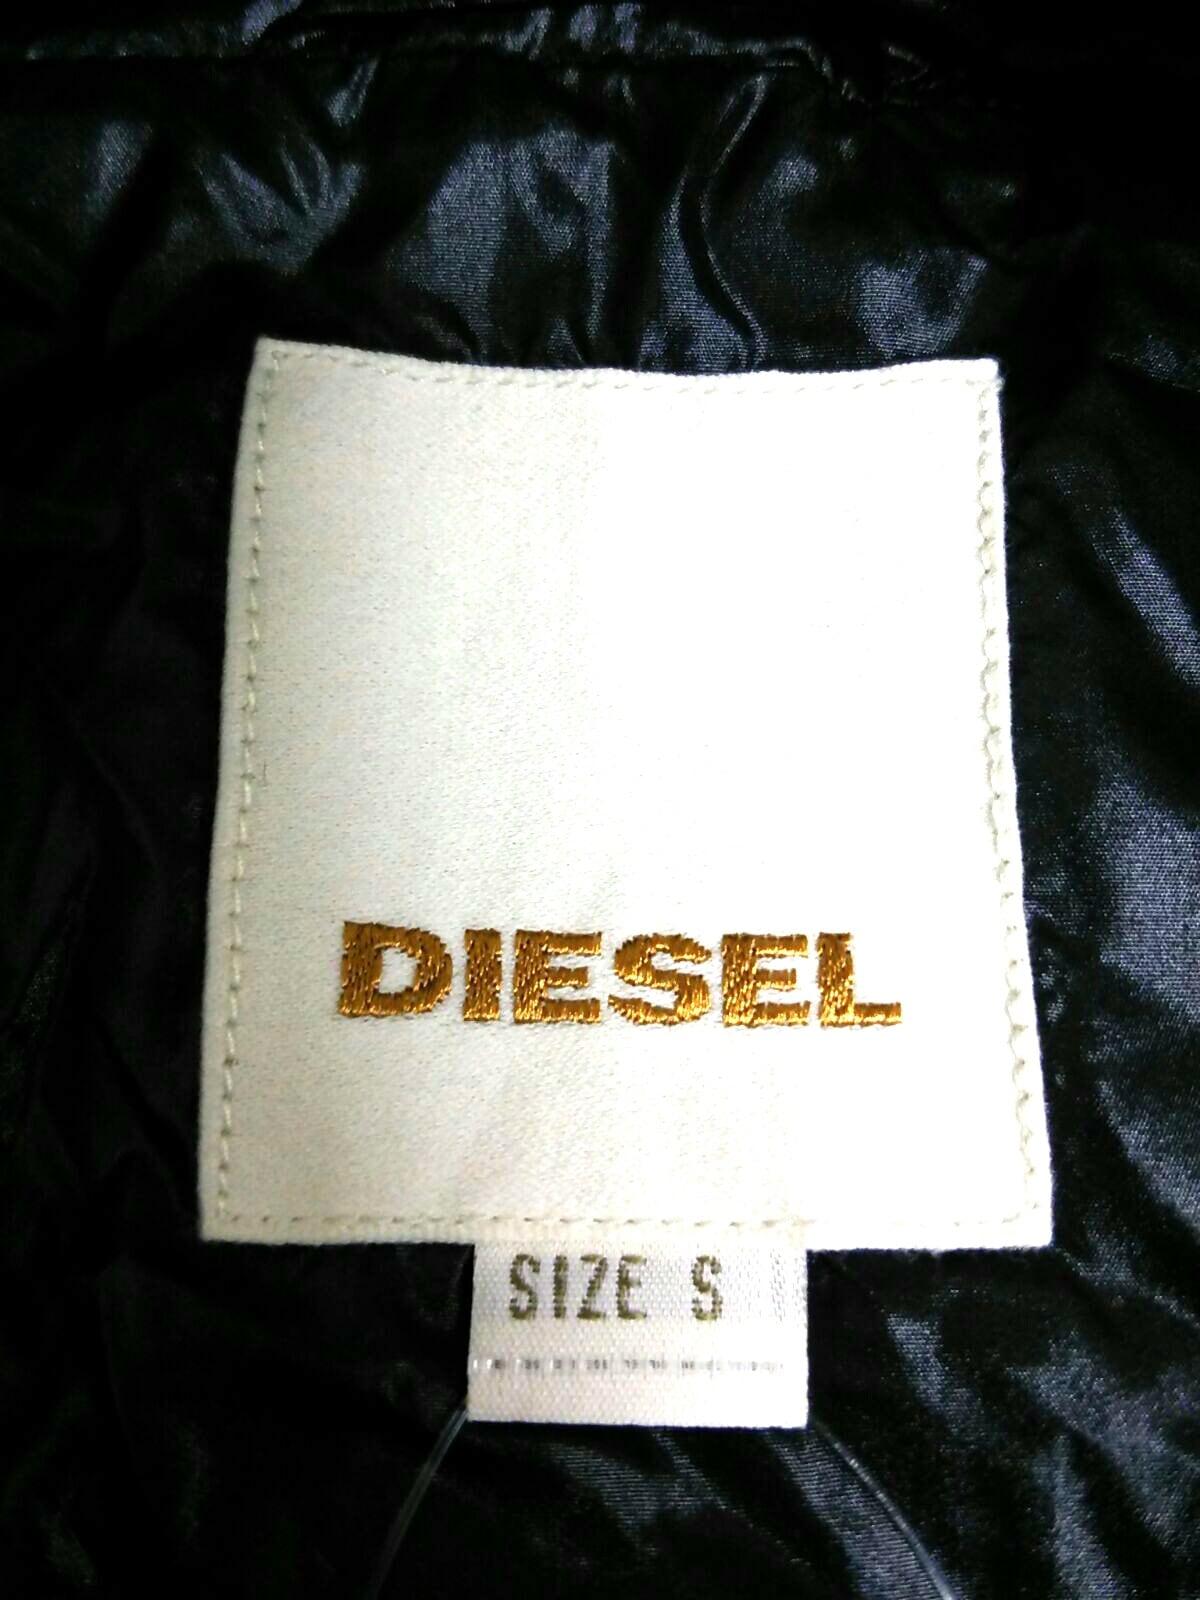 DIESEL(ディーゼル)のブルゾン